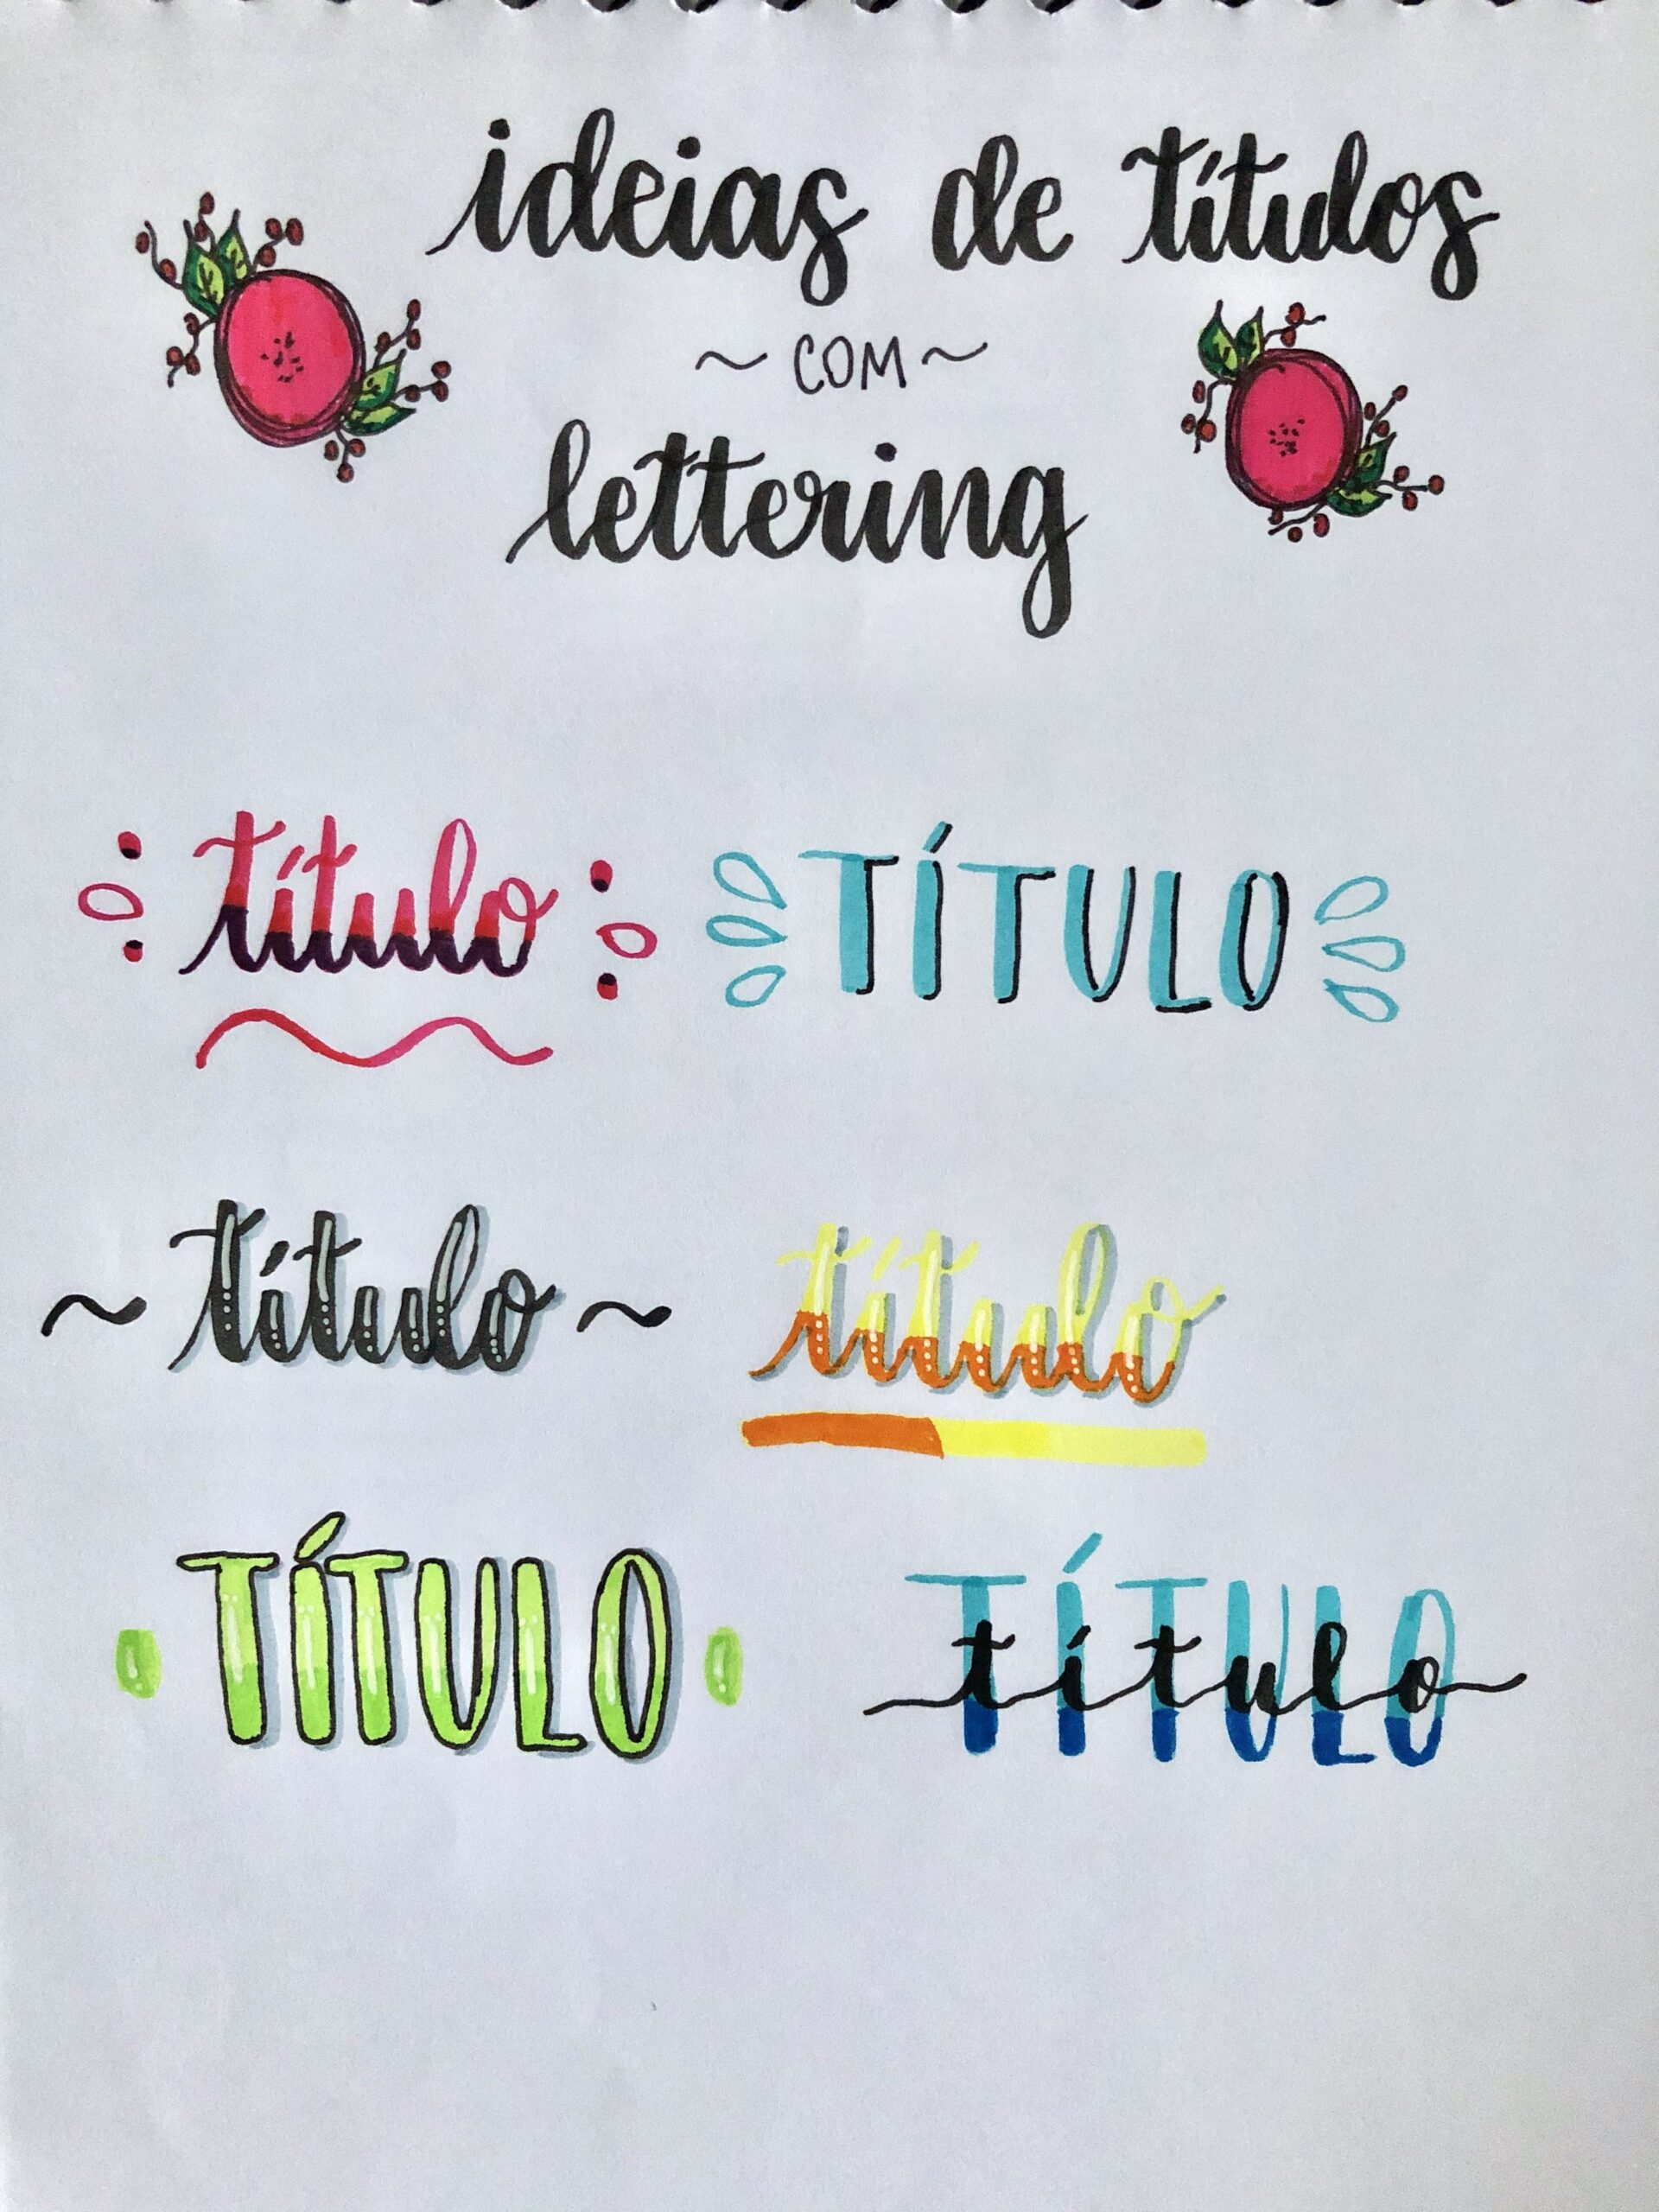 titulos con lettering 1 scaled